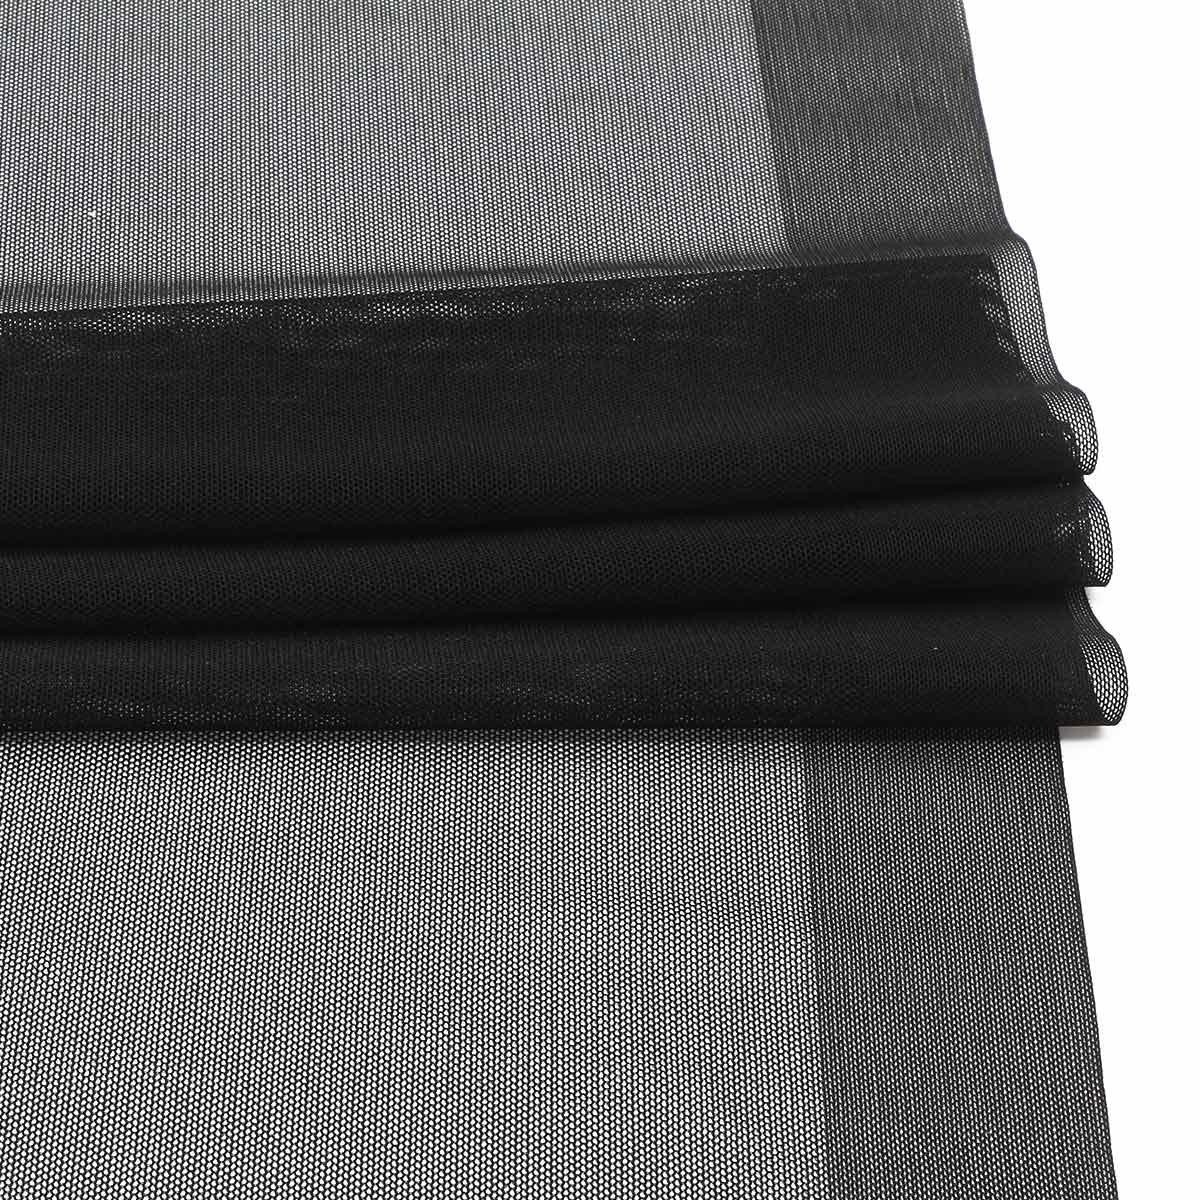 SU-7 Ткань эластичная бельевая 20 см*10 м